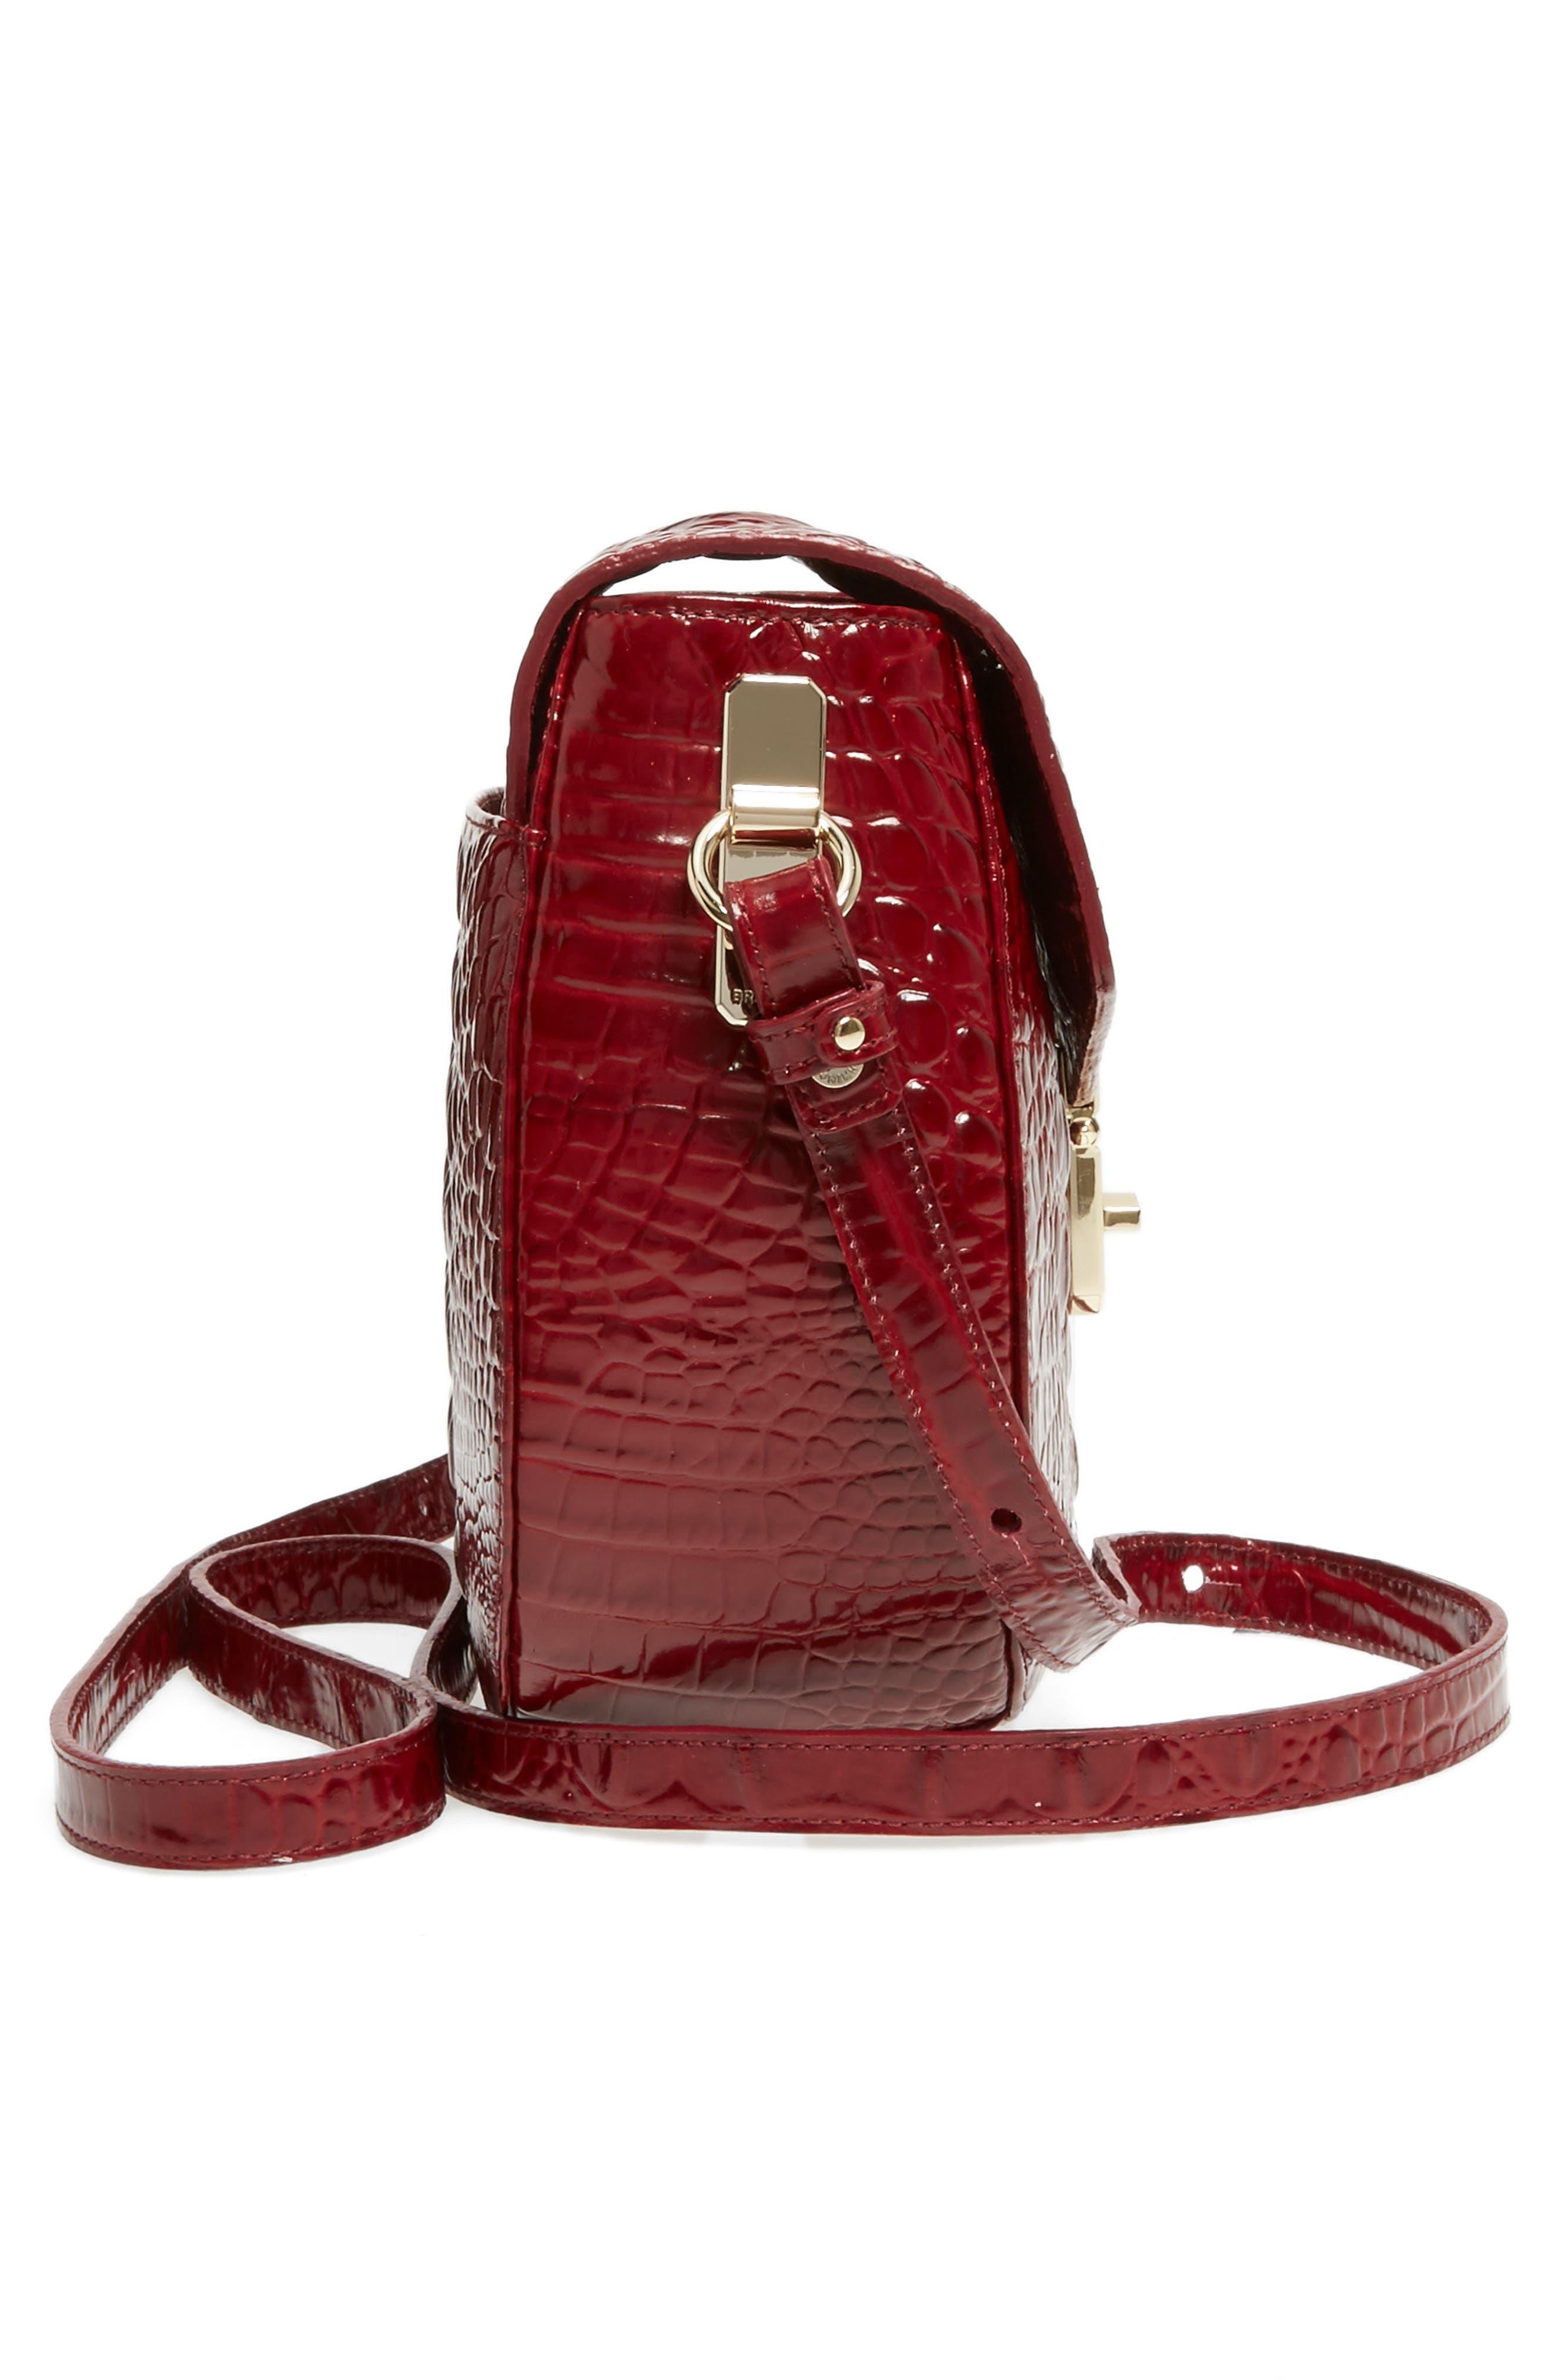 Melbourne - Lizzie Leather Crossbody Bag,                             Alternate thumbnail 25, color,